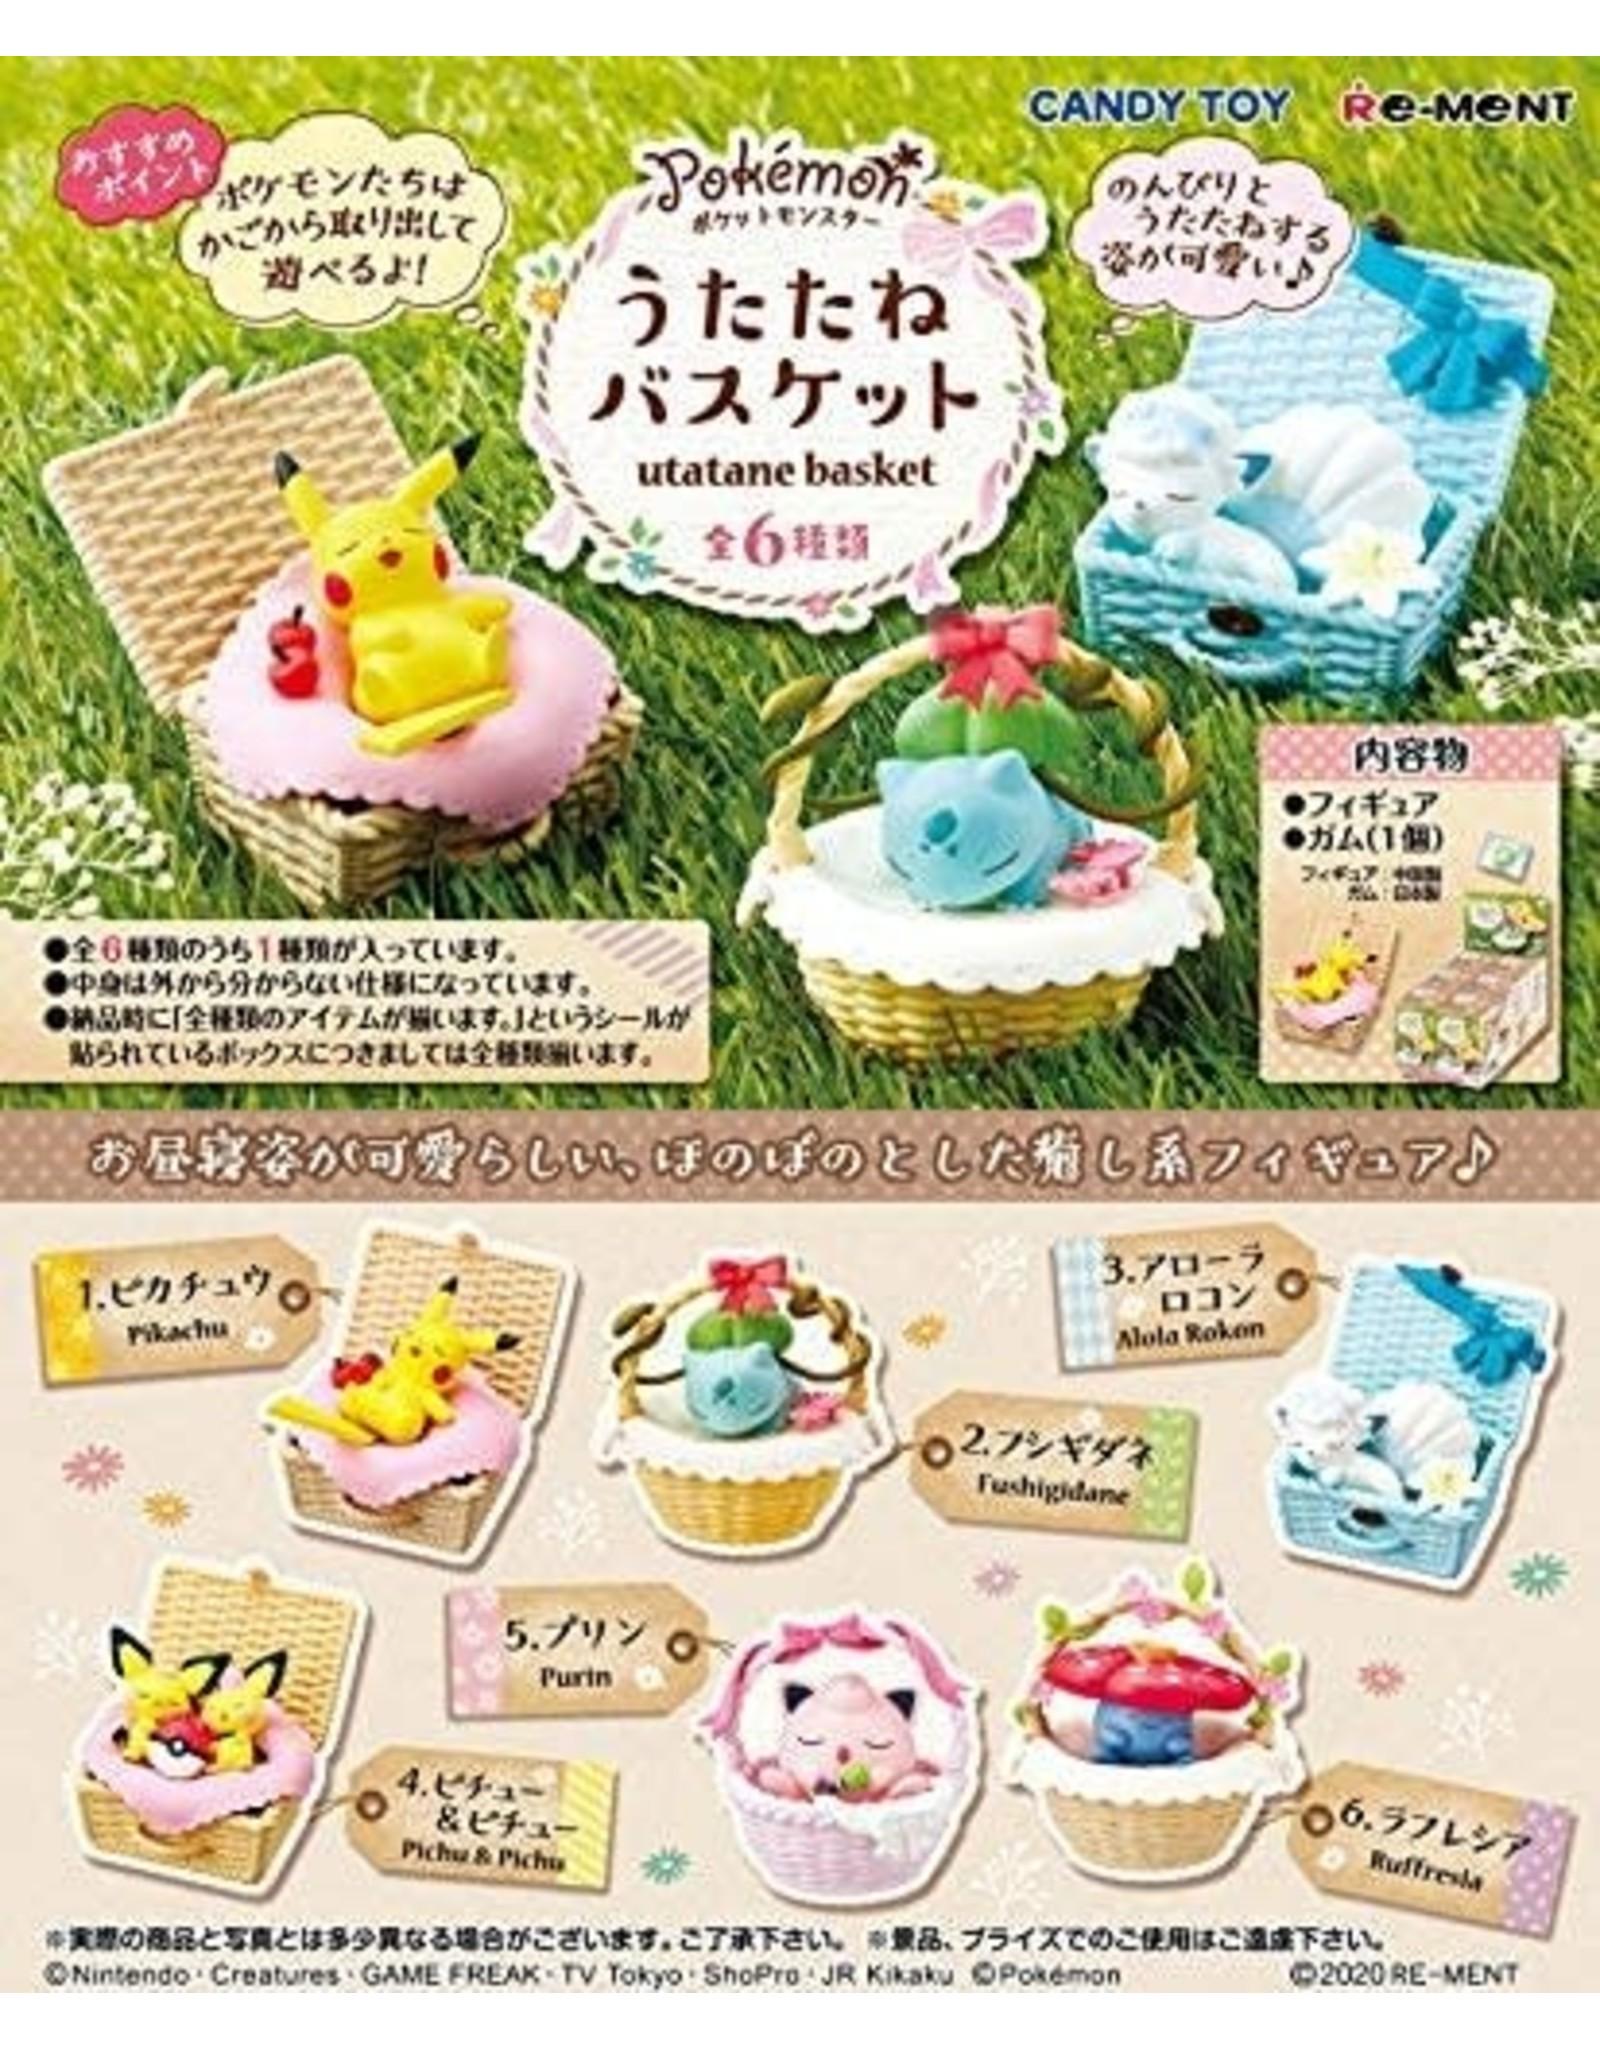 Re-Ment - Pokémon - Utatane Basket - Complete set of 6